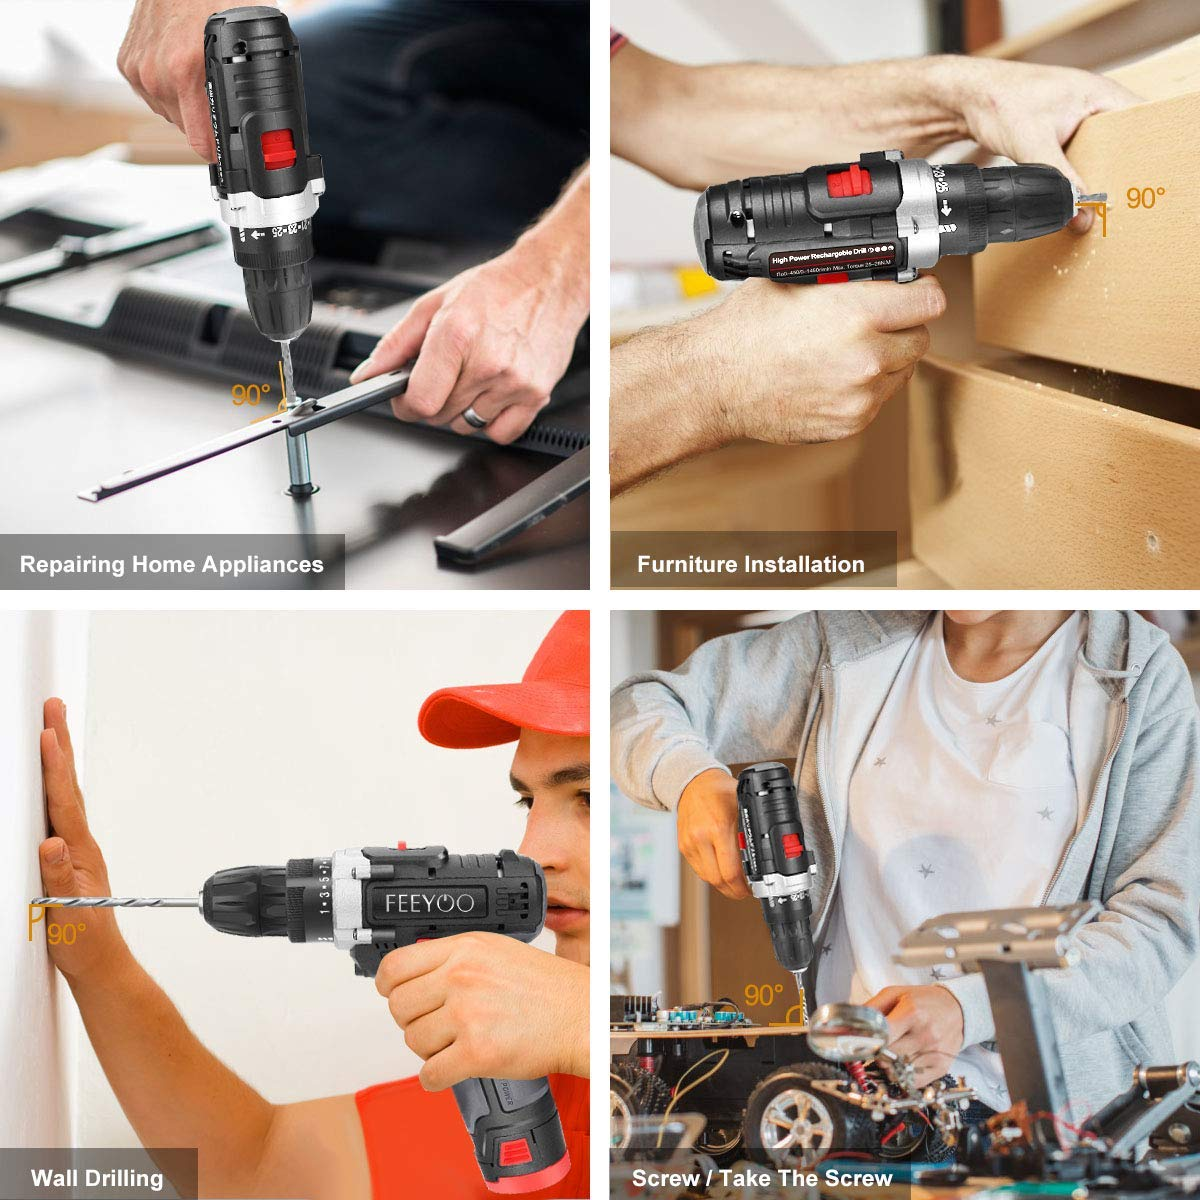 Perceuse visseuse sans fil FEEYOO 31Pcs Kit Perceuse Electrique Professionnel pour Bricolage 2 Batteries Li-ion 12.8V 3900mAh, Couple Maxi 26Nm, 2 Vitesses, Mandrin Auto-serrant 10mm